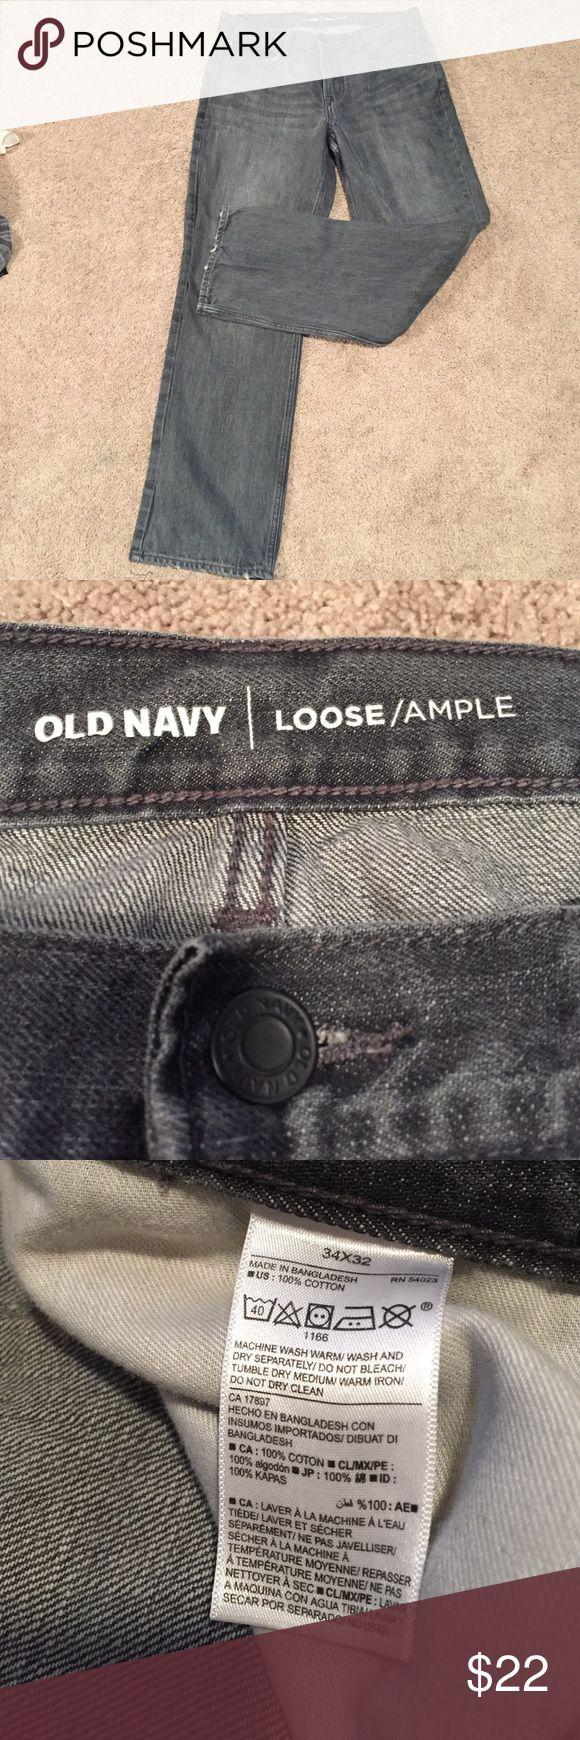 Old navy men's loose fit jeans size 34x32 Men's old navy jeans size 34x32 loose ample fit Old Navy Jeans